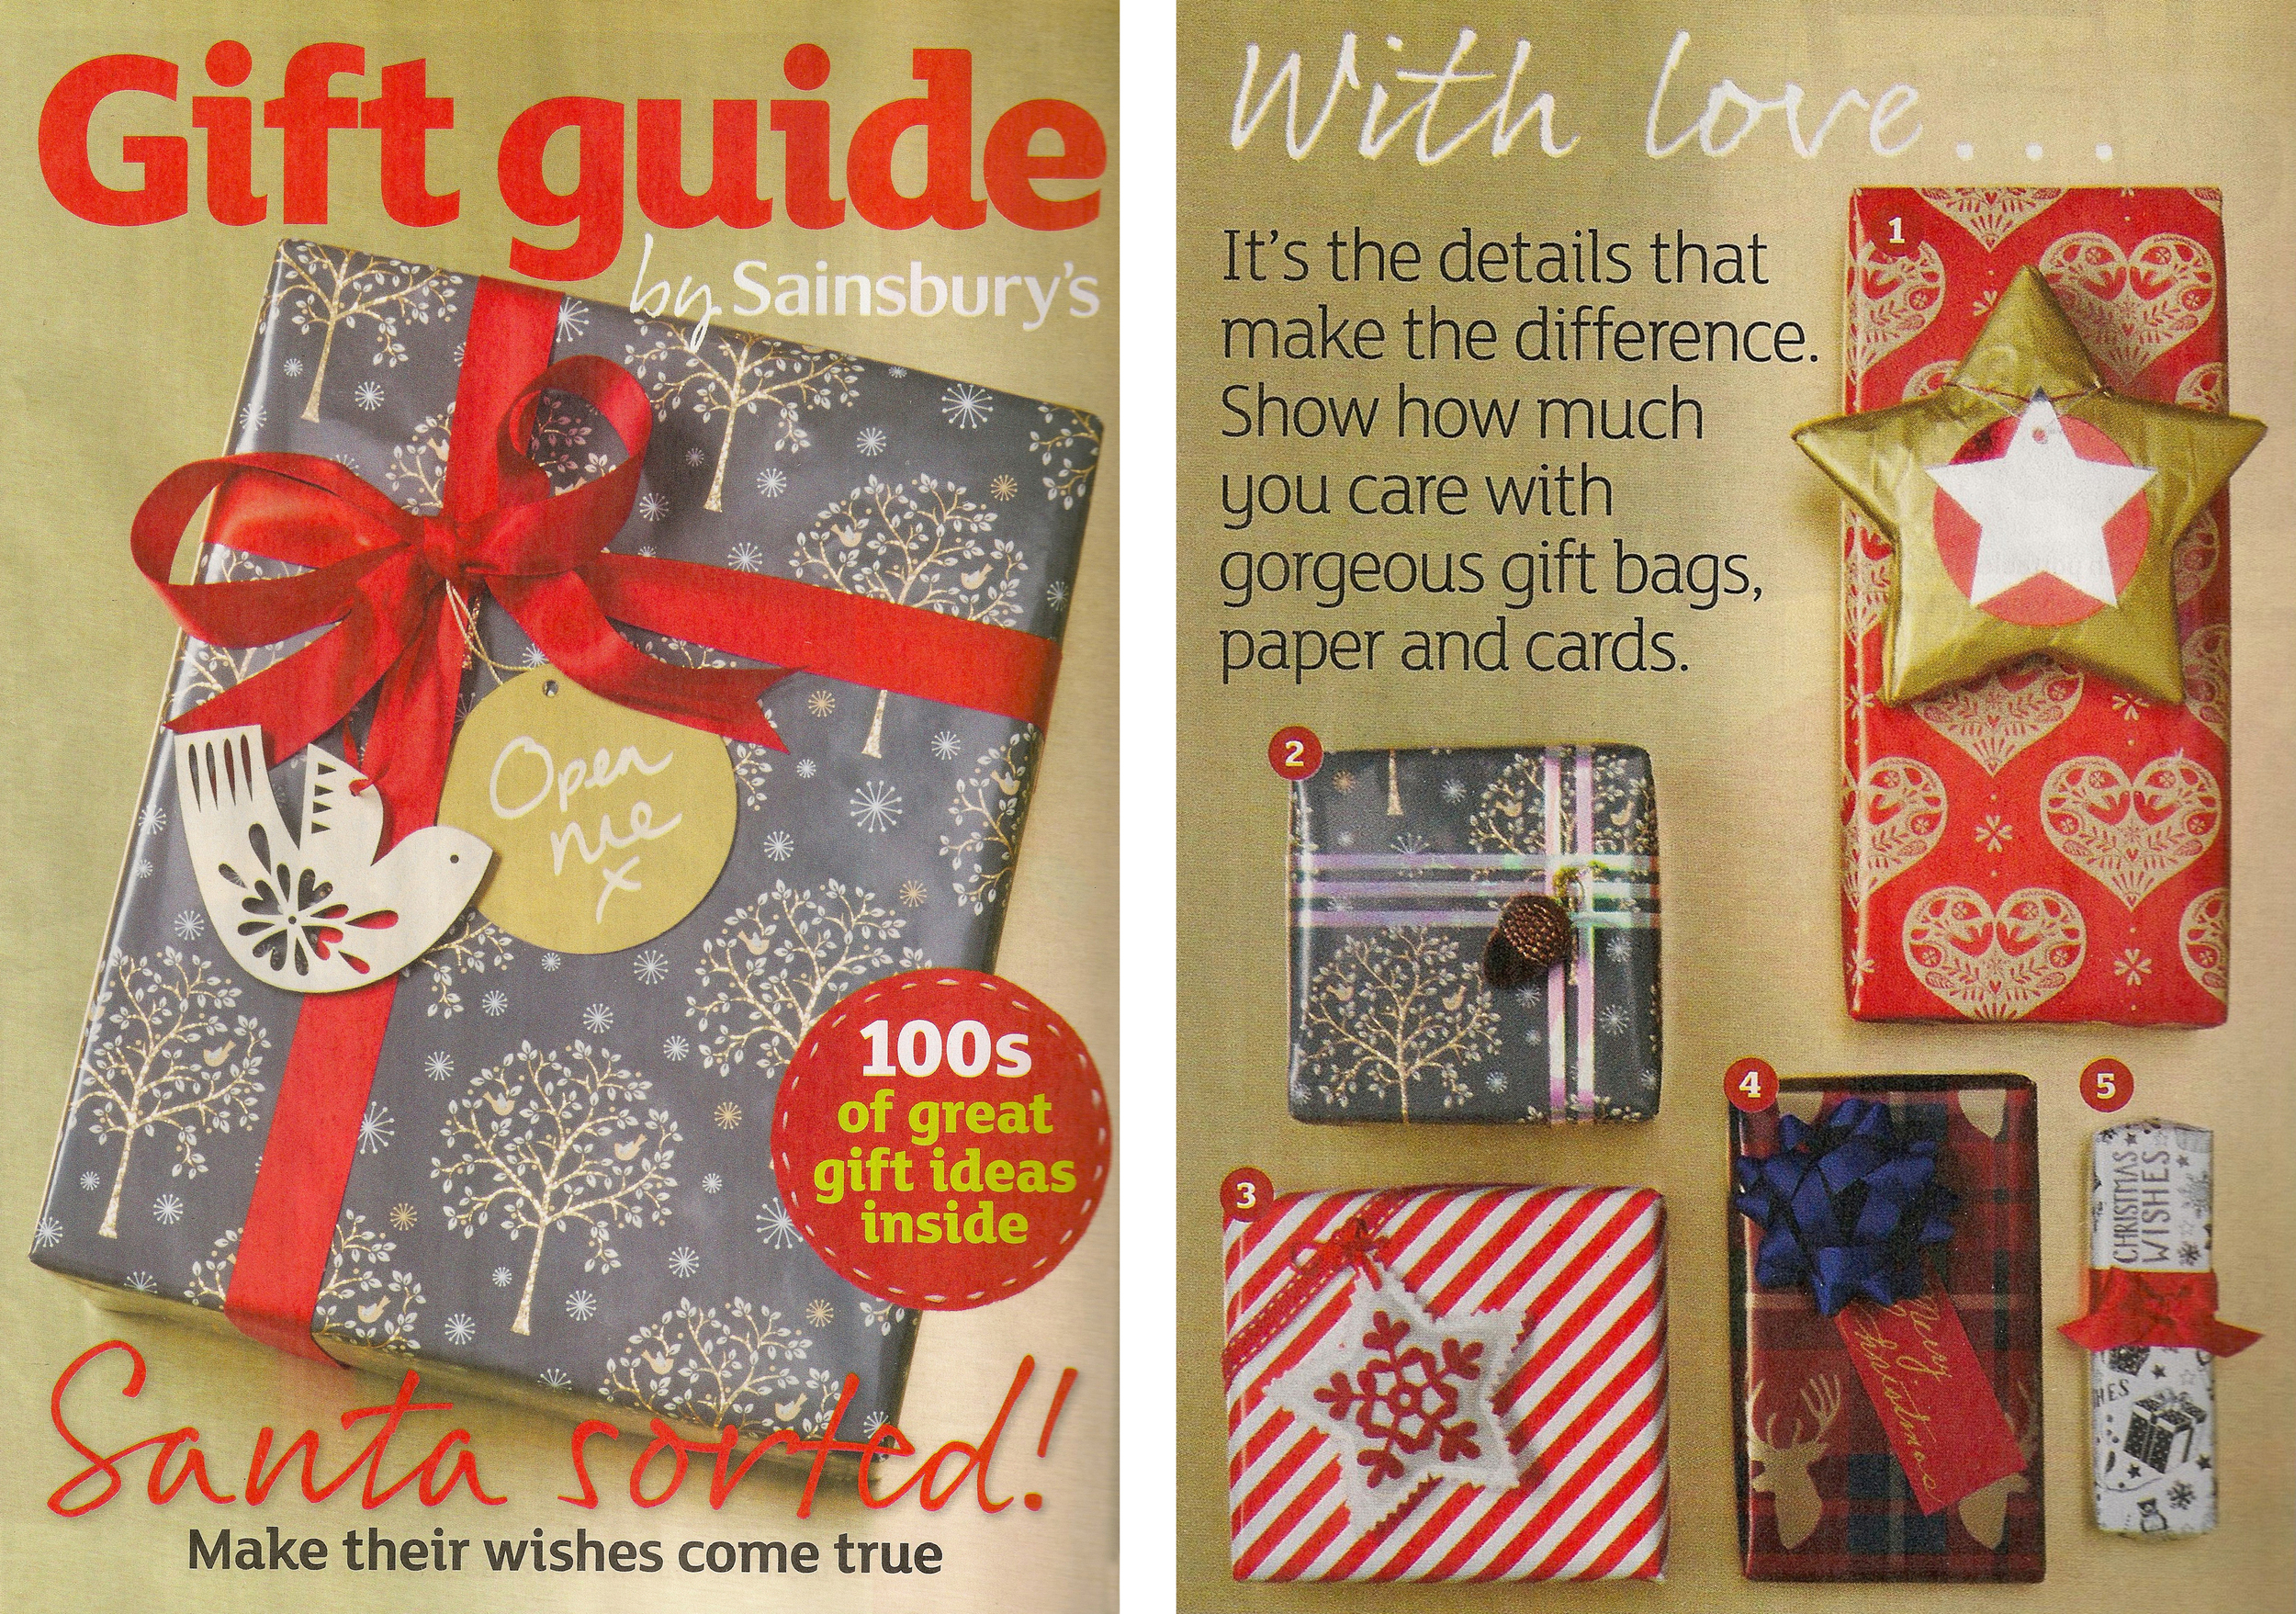 12b. Sainsbury's Christmas Magazine 2013 Giftwrapping Ideas by Interior Stylist Joanna Thornhill.jpeg copy.jpg